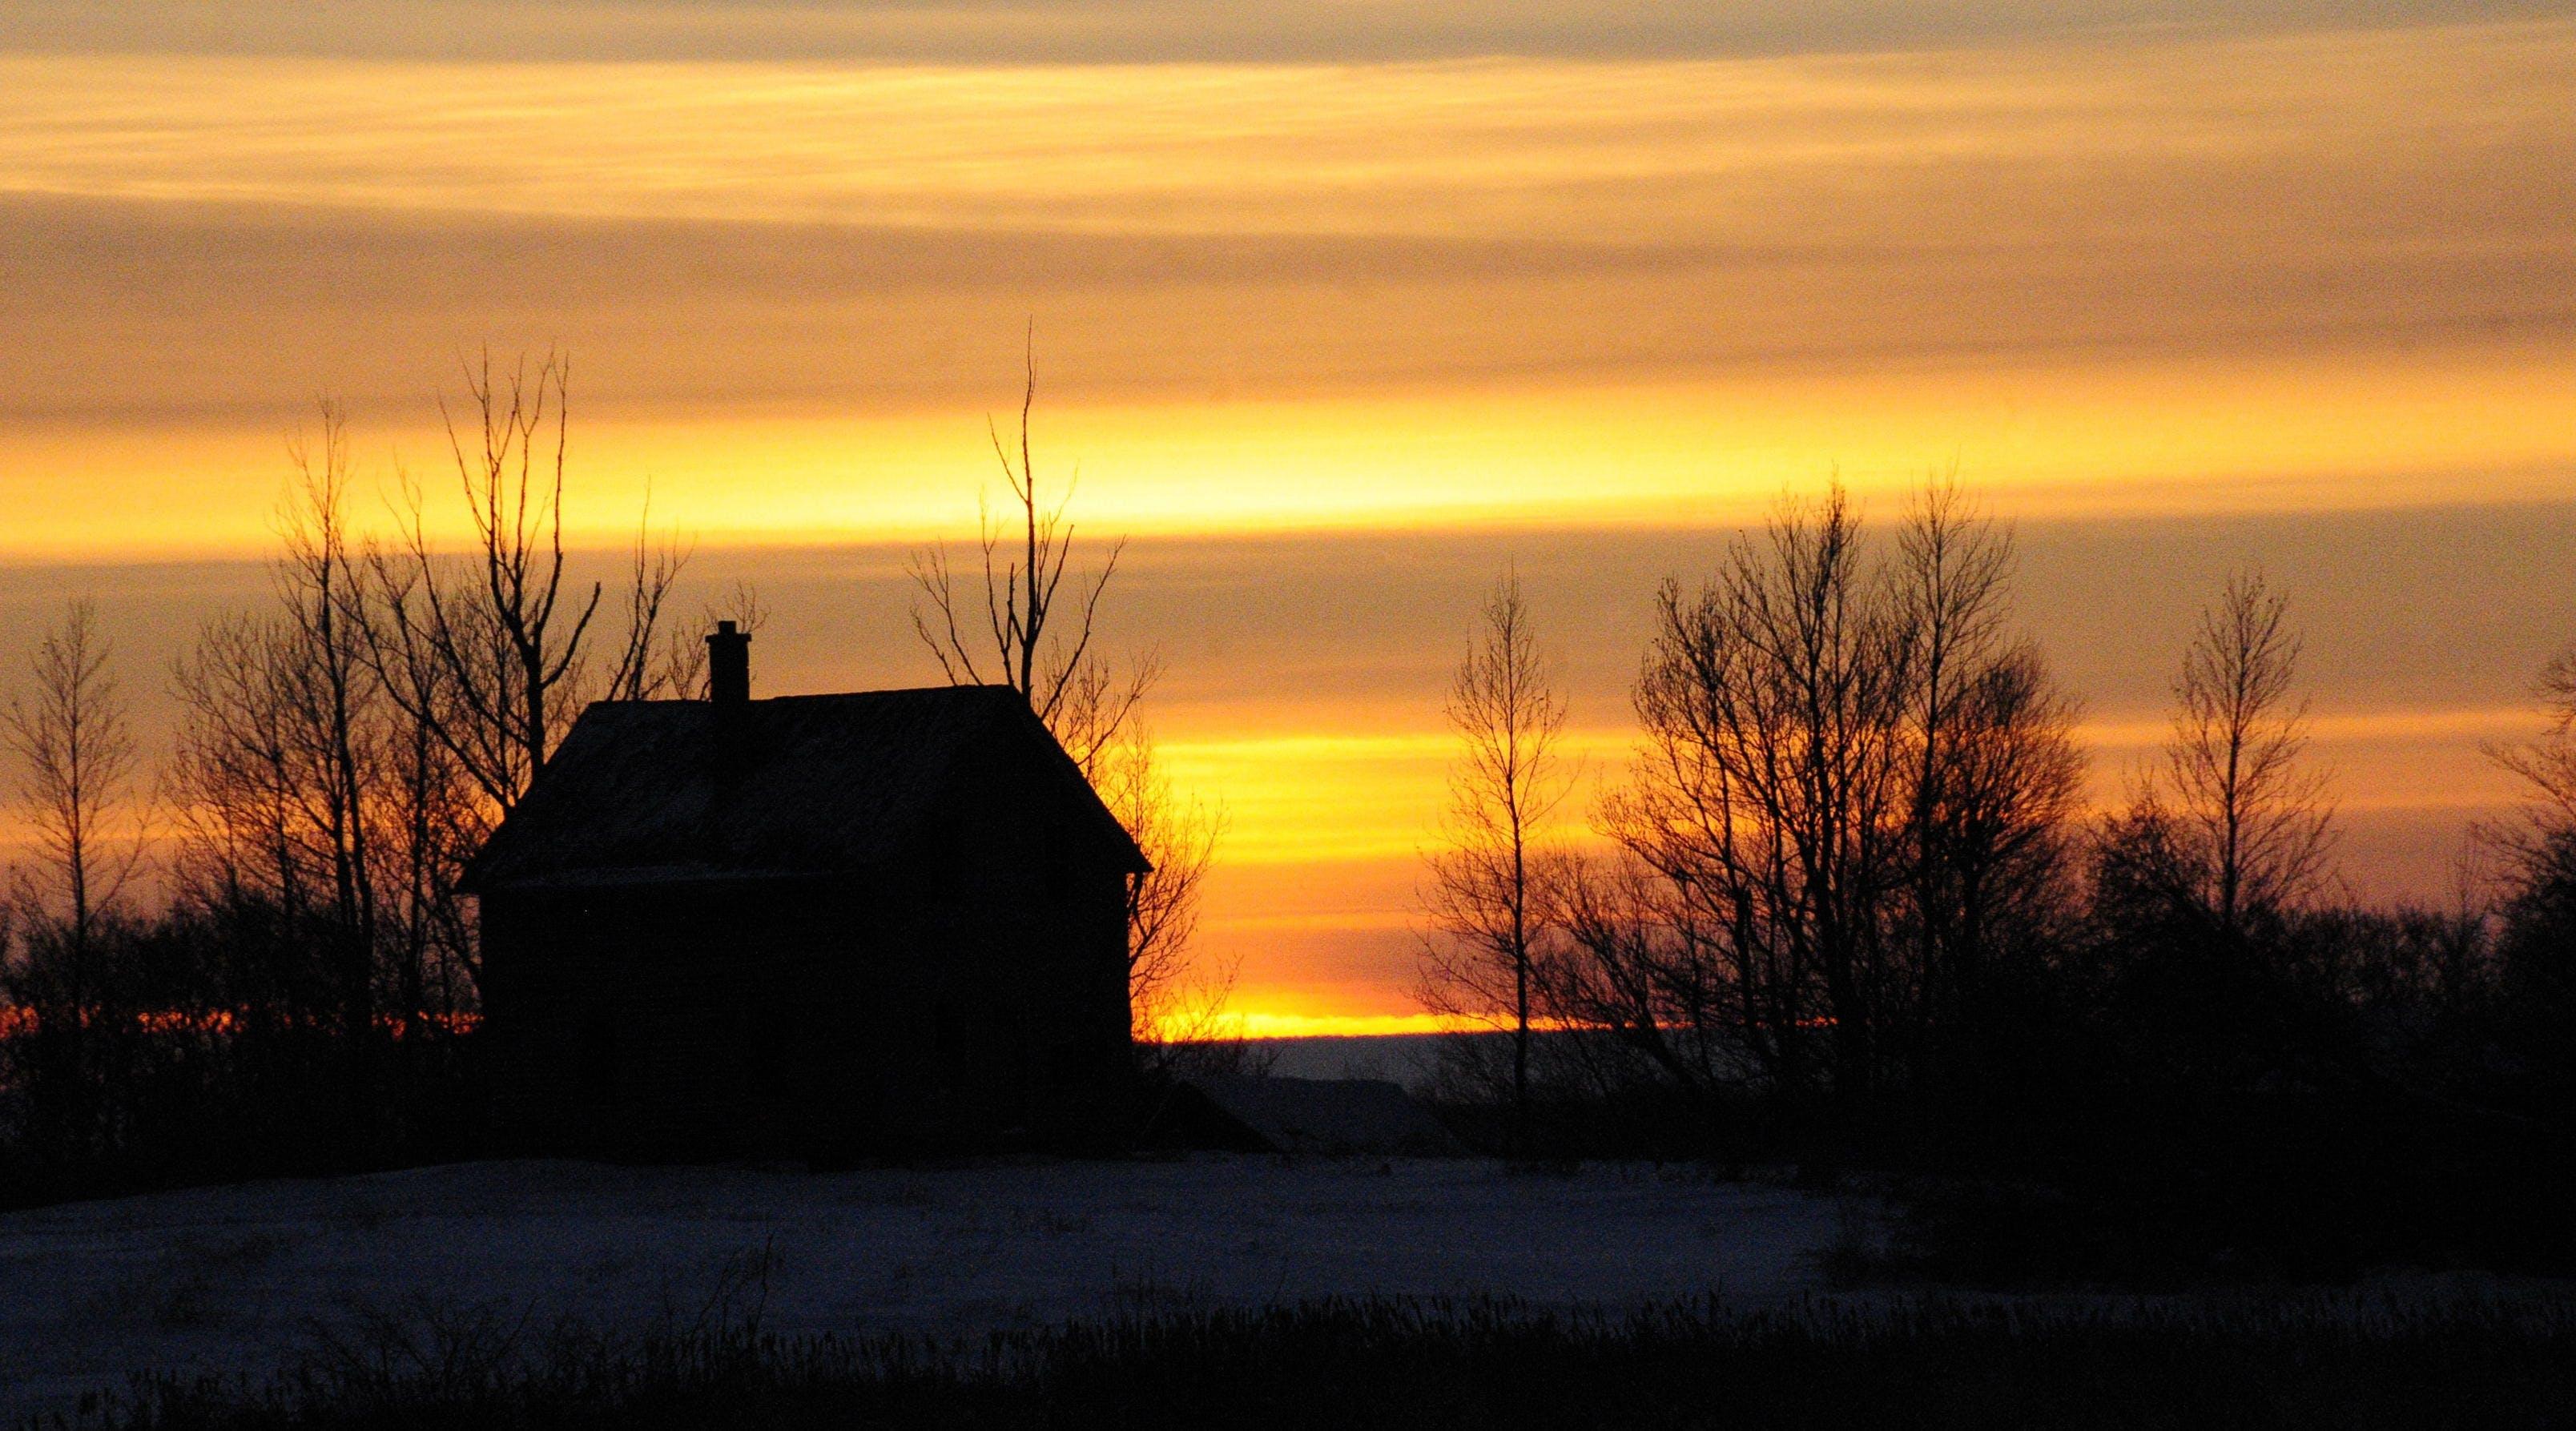 Free stock photo of sunset, farm, evening, farm house